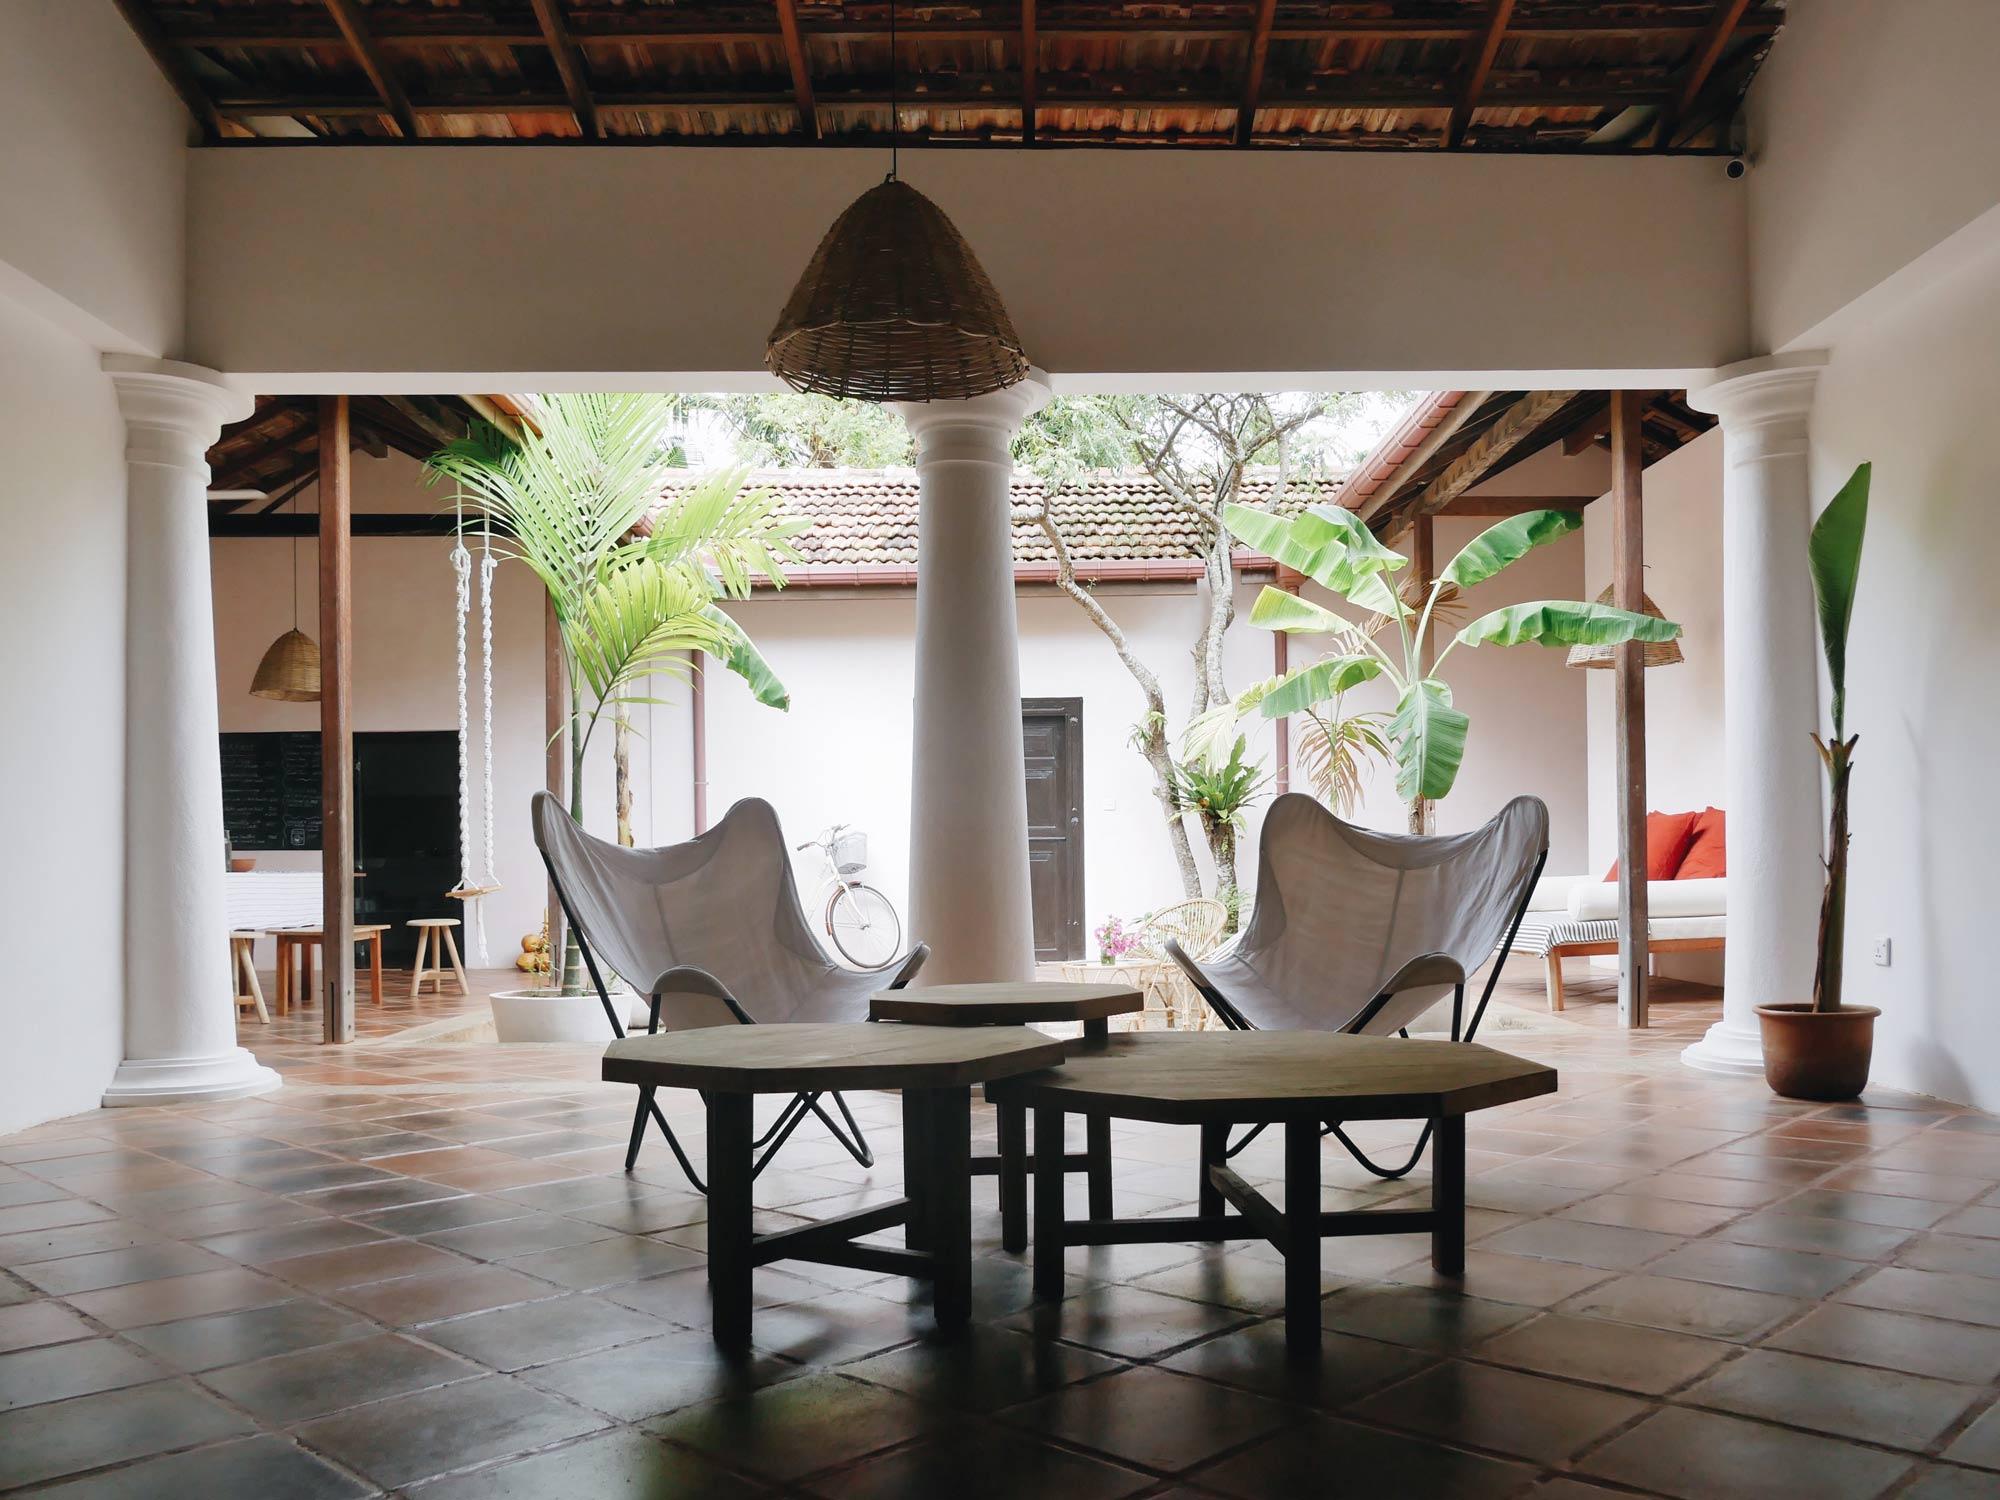 acanthus sri lanka travel photography interior design